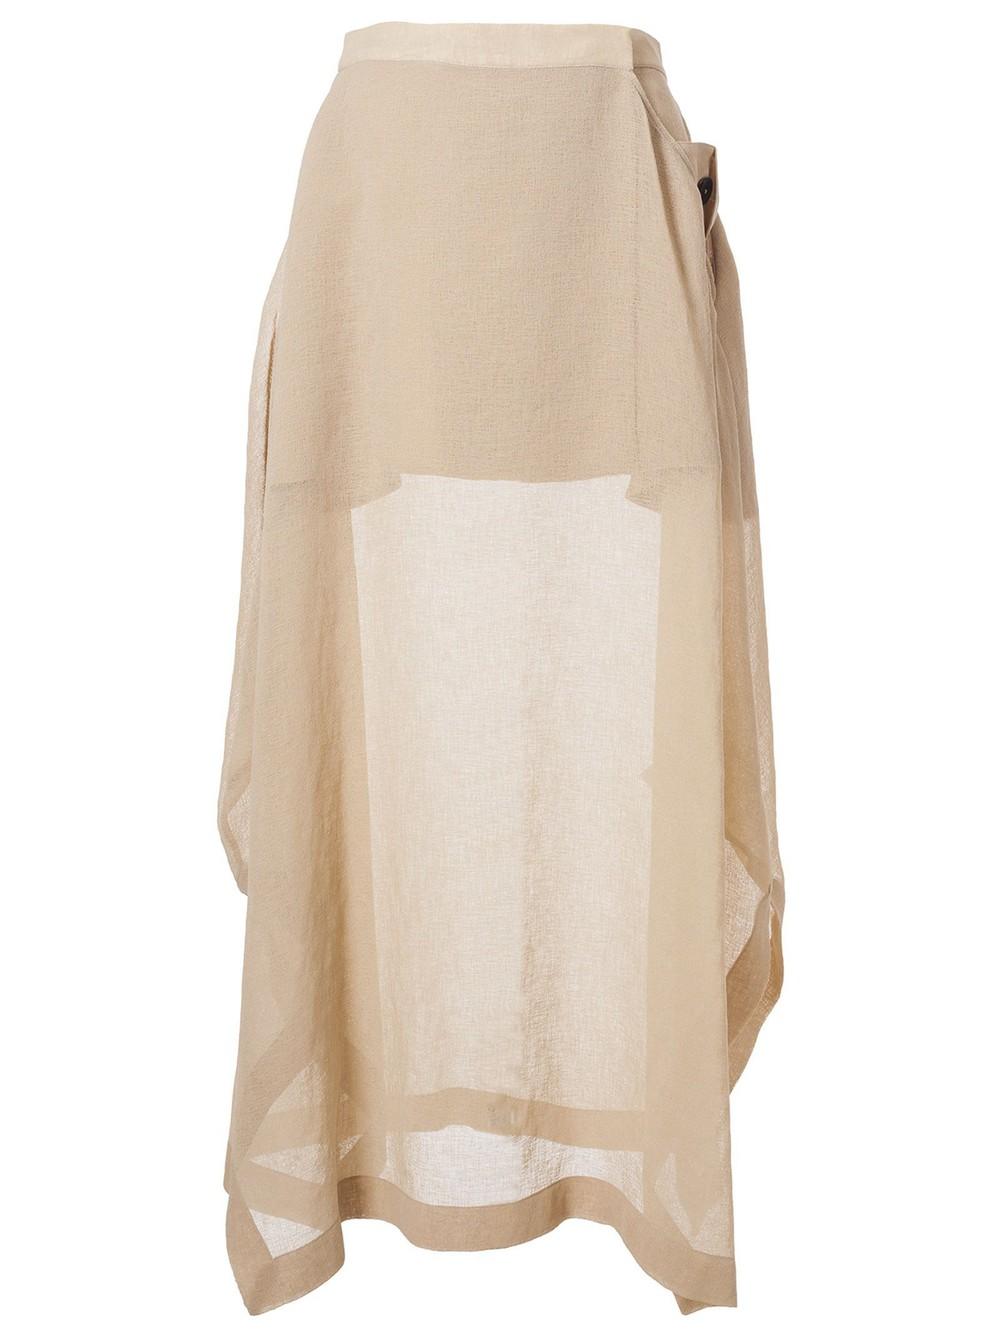 Jil Sander Draped Skirt in beige